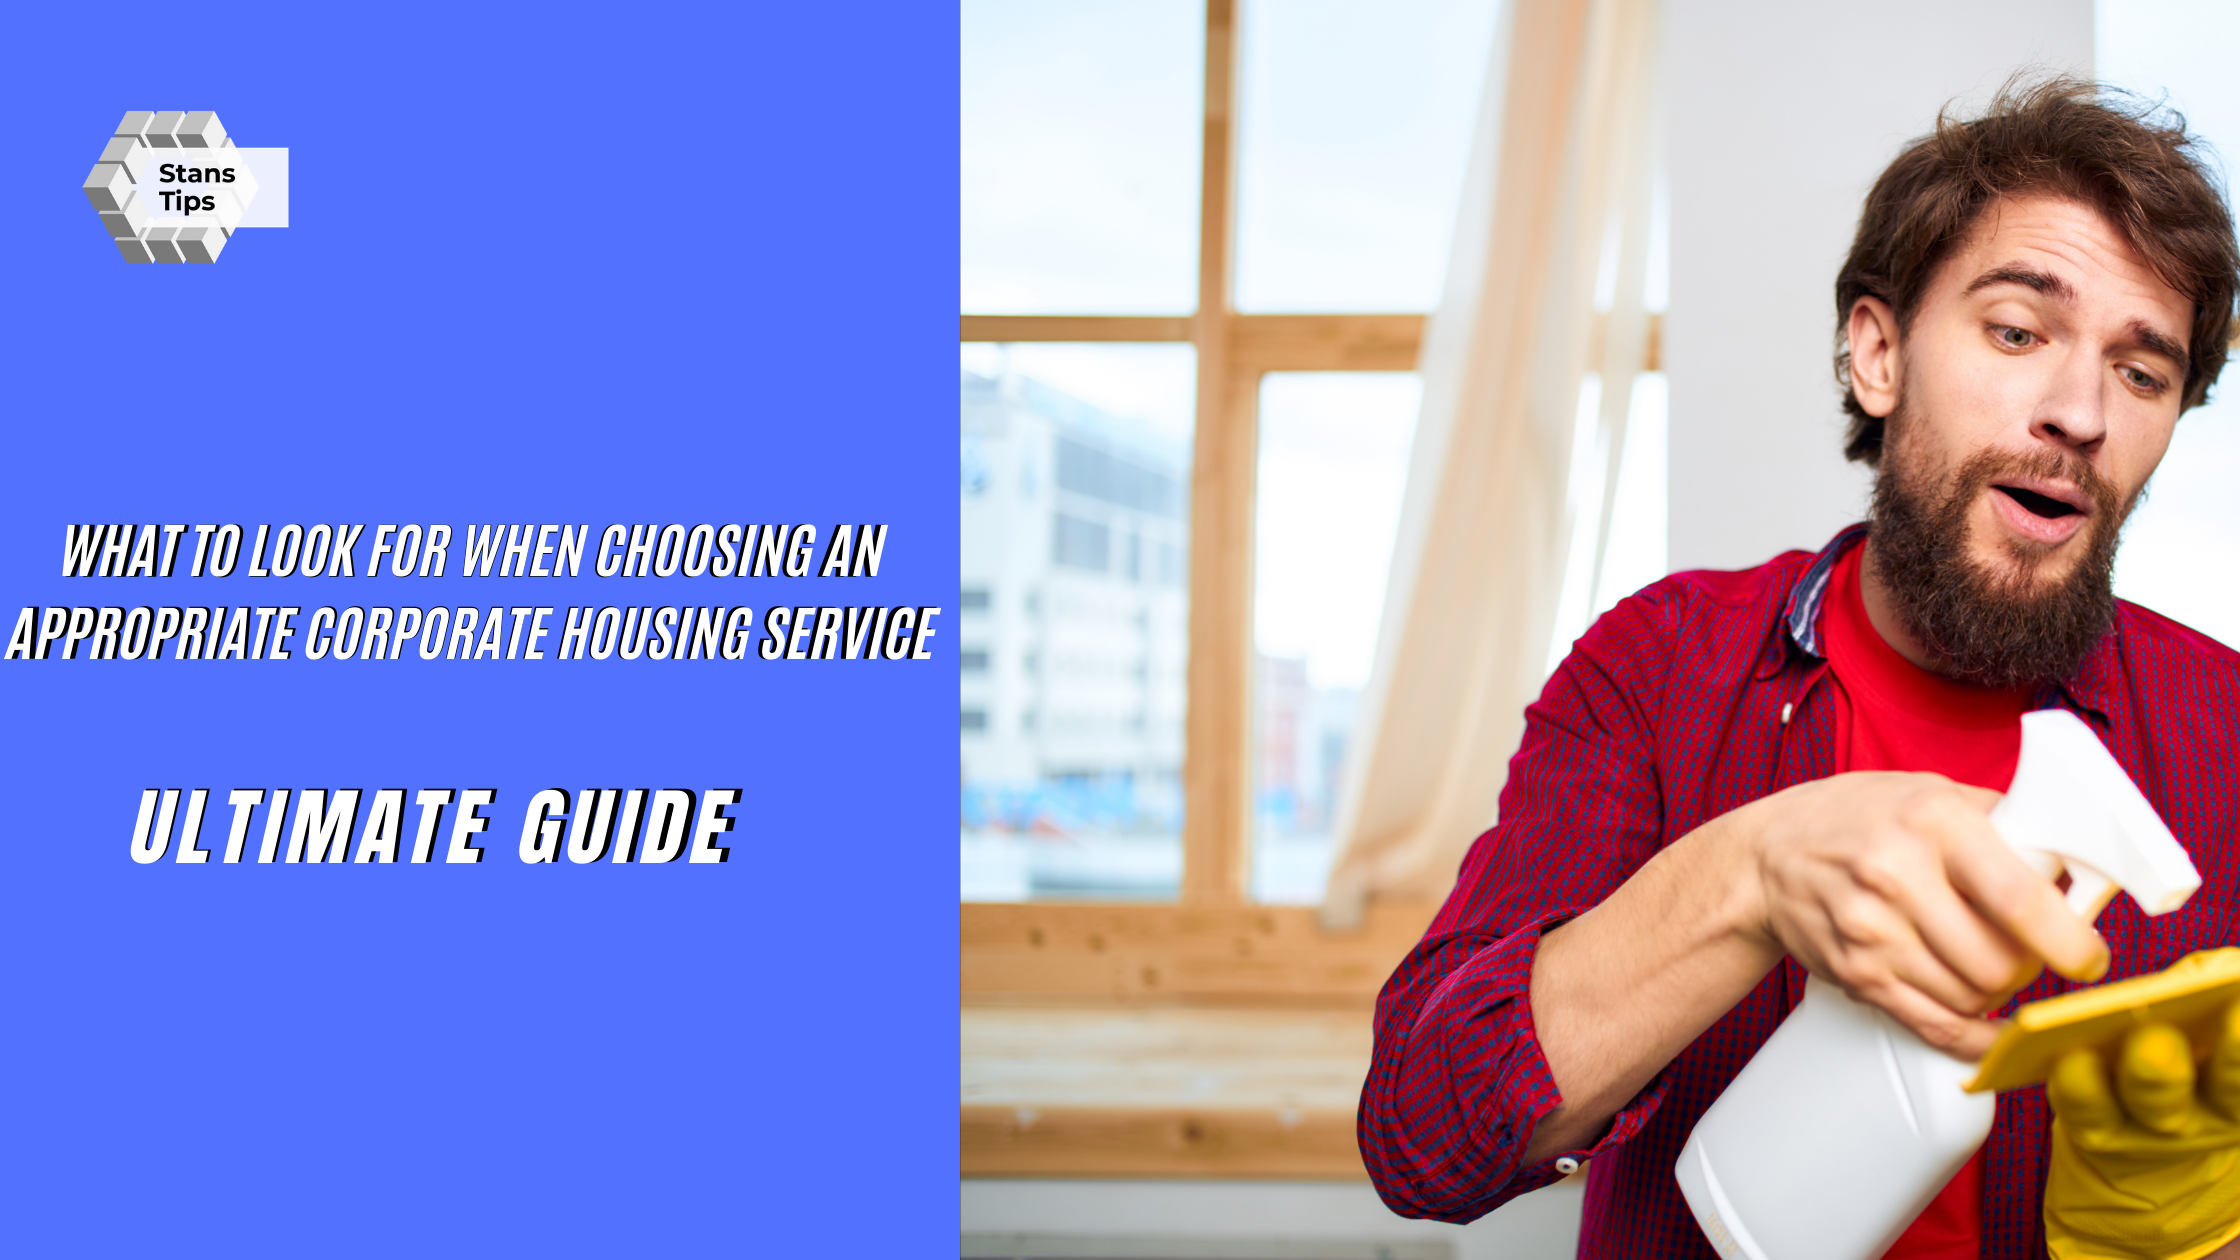 Corporate housing service